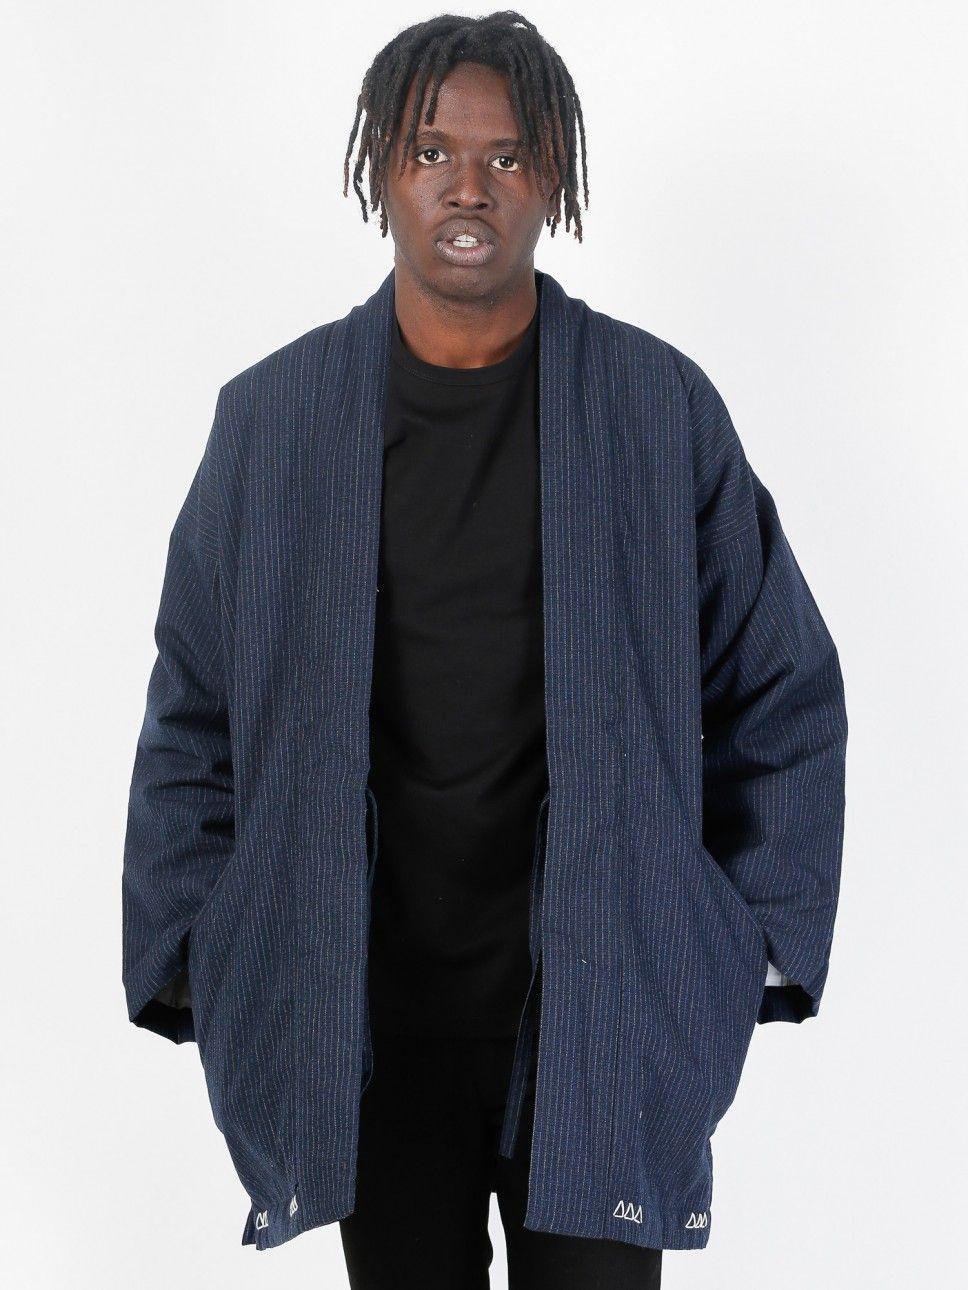 Coat Stripe Wool visvim visvim Dotera Stripe Dotera Wool Coat OwU771qBa